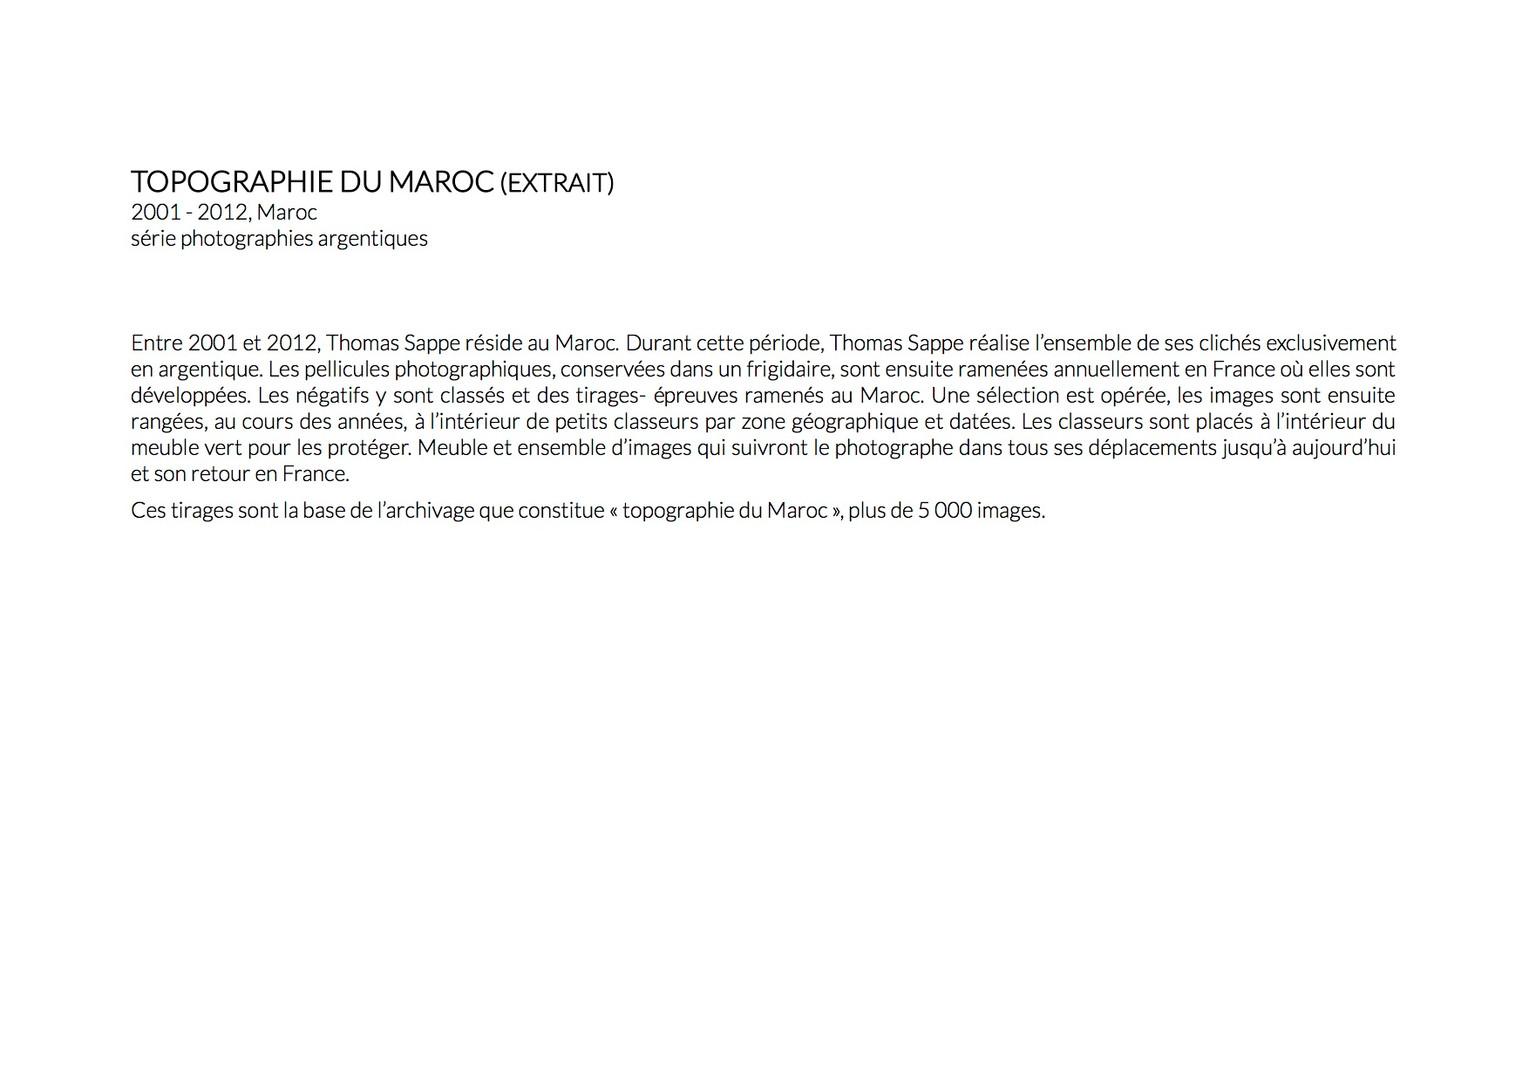 TOPOGRAPHIE DU MAROC - Lato.JPG